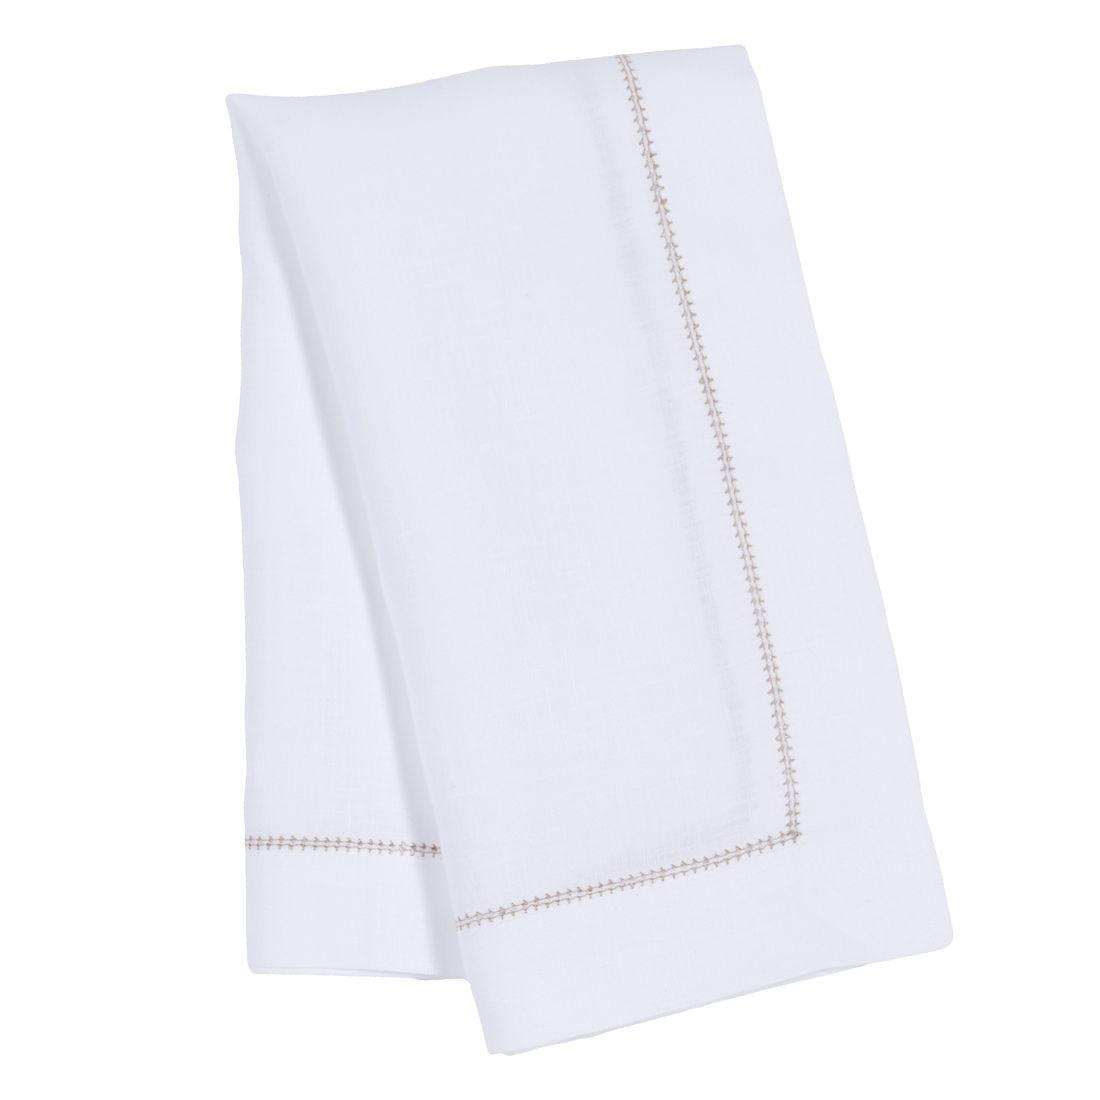 White Napkin With Tan Hemstitch White Napkins Linen Dinner Napkins Luxury Linen